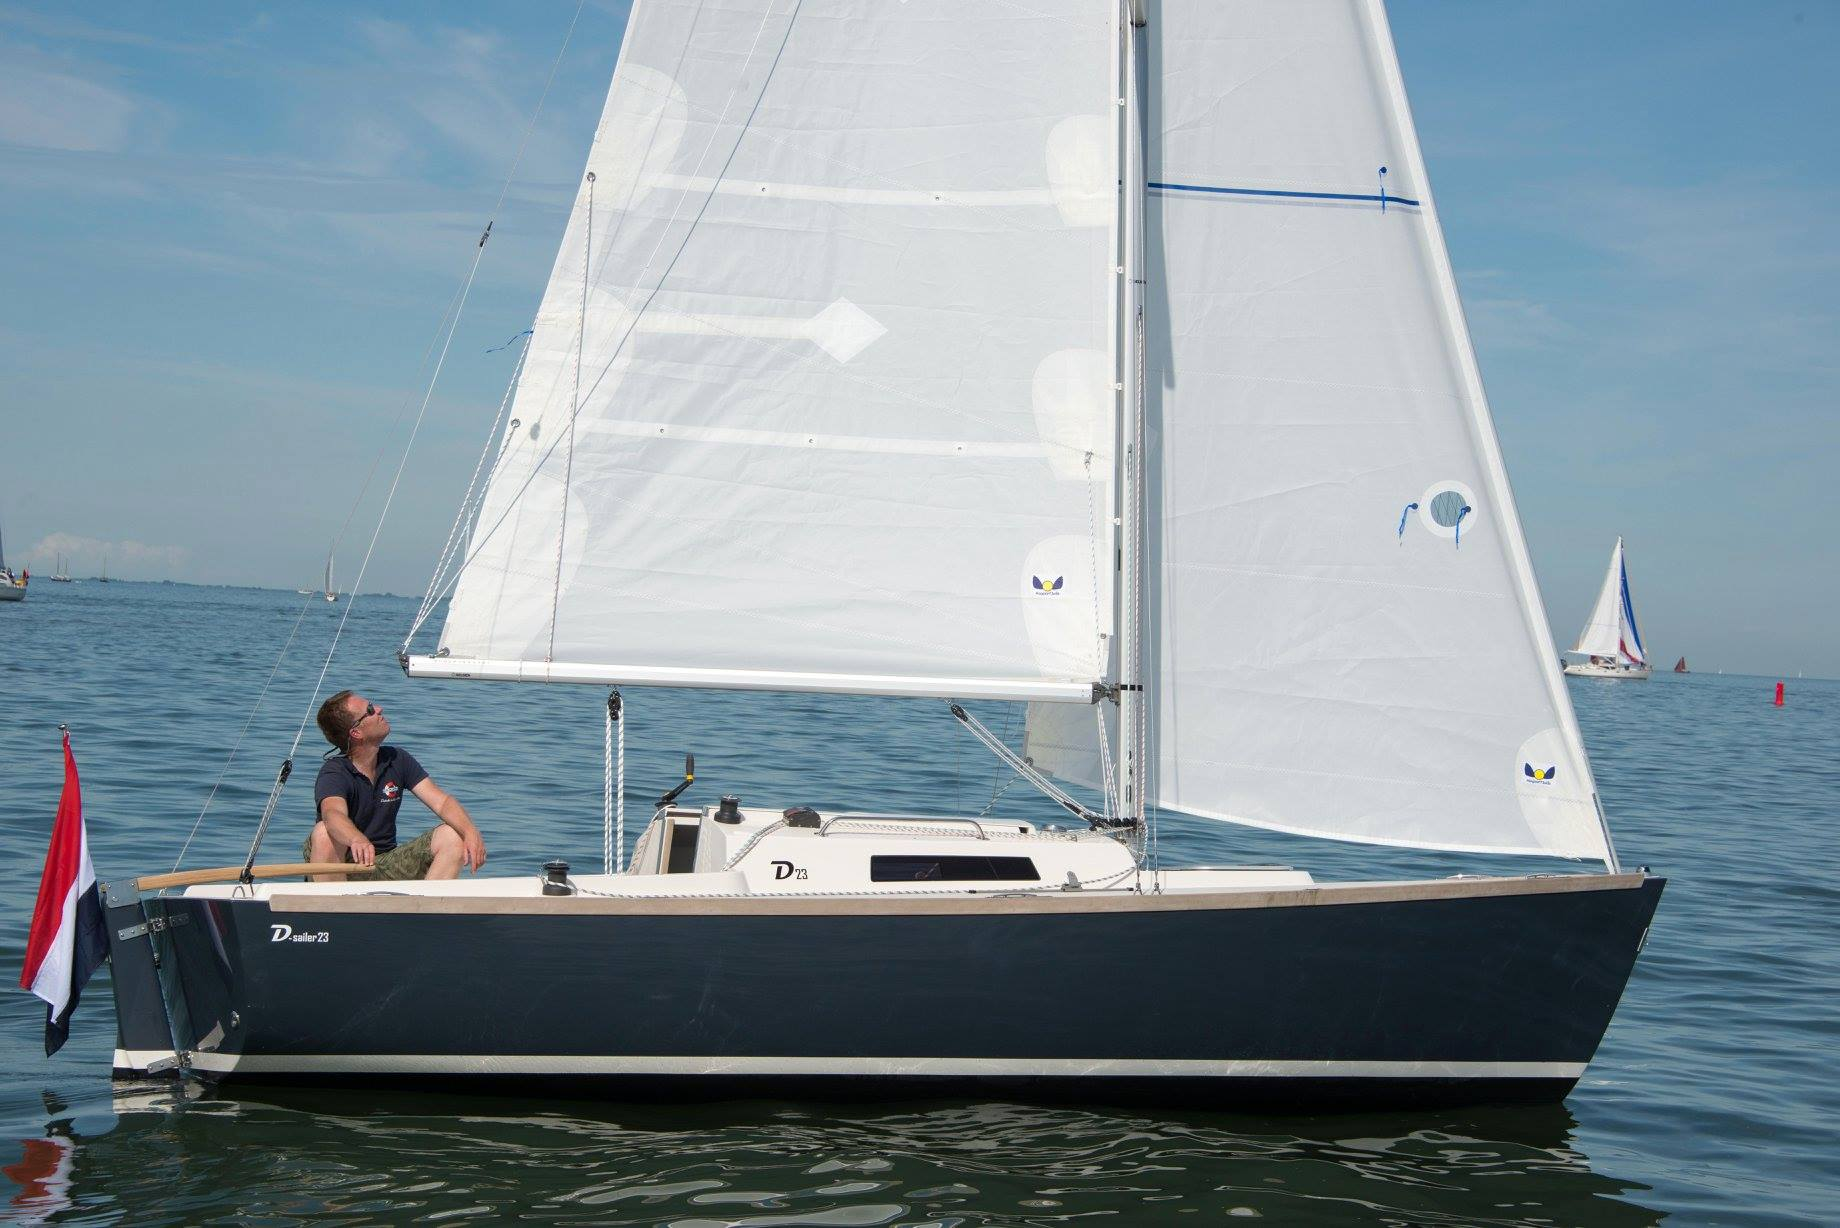 Damarin - D-sailer 23 01